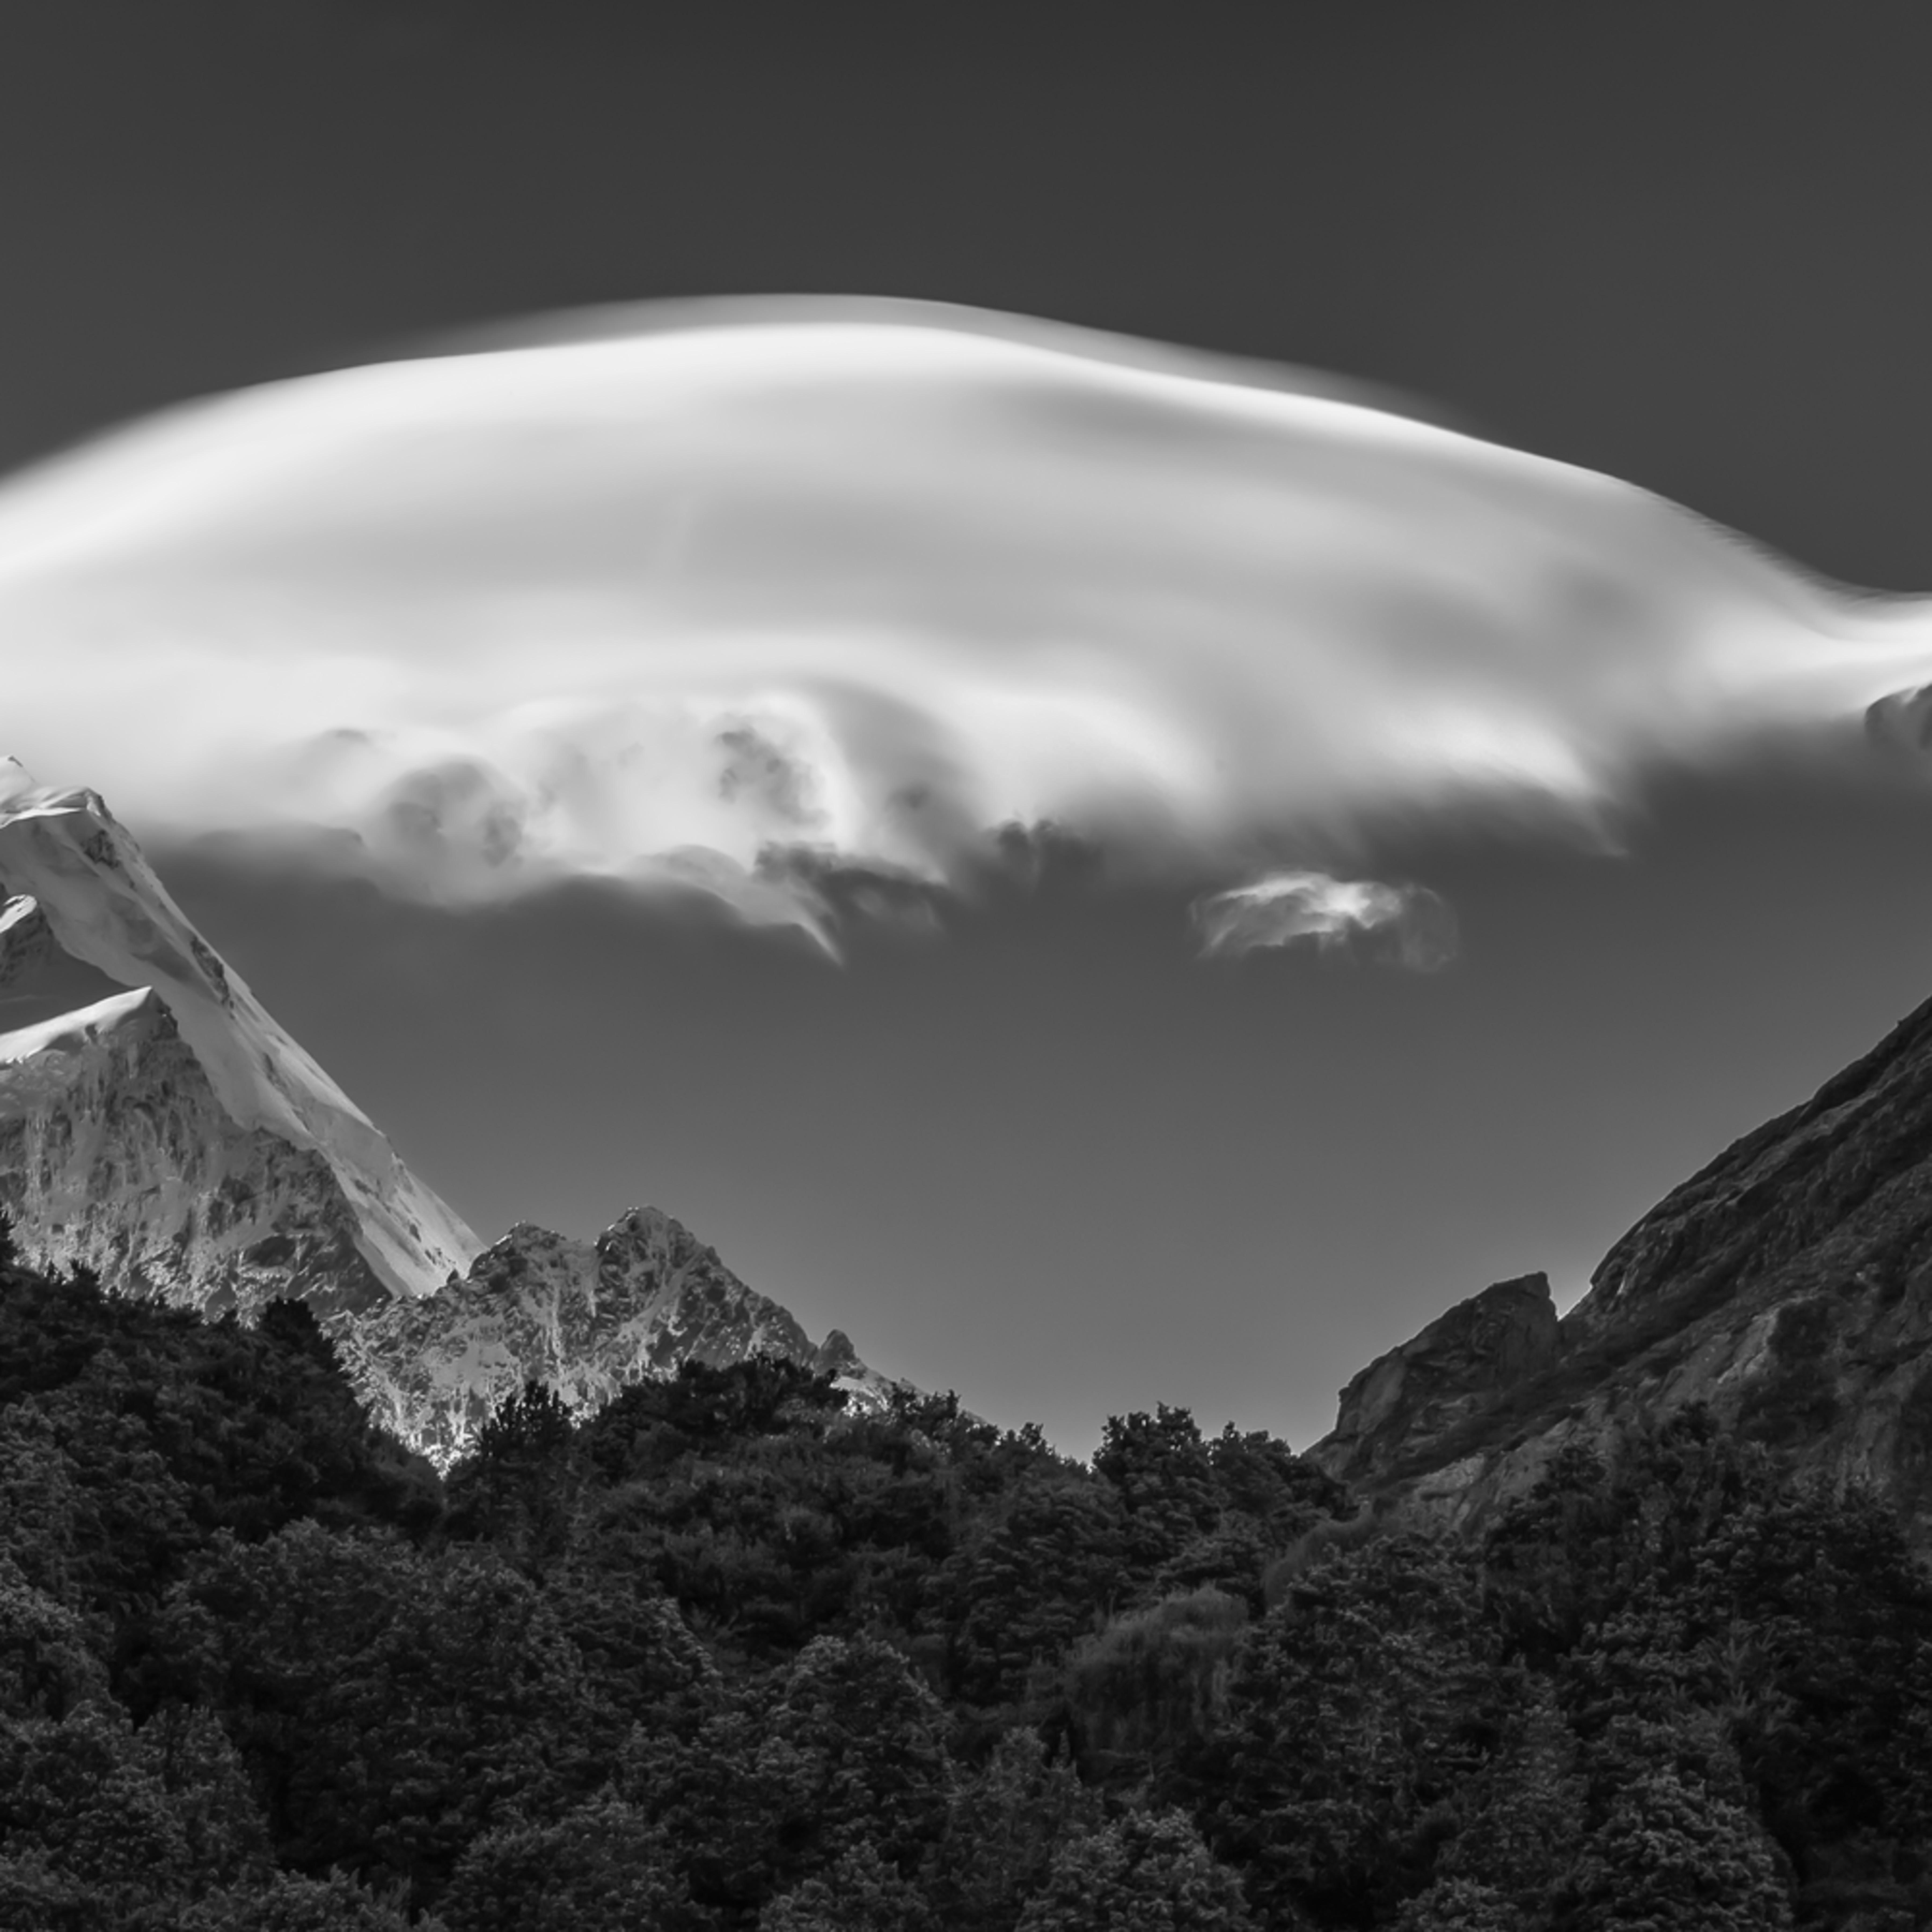 Mt. cook lenticular cloud 24x36 haza7v